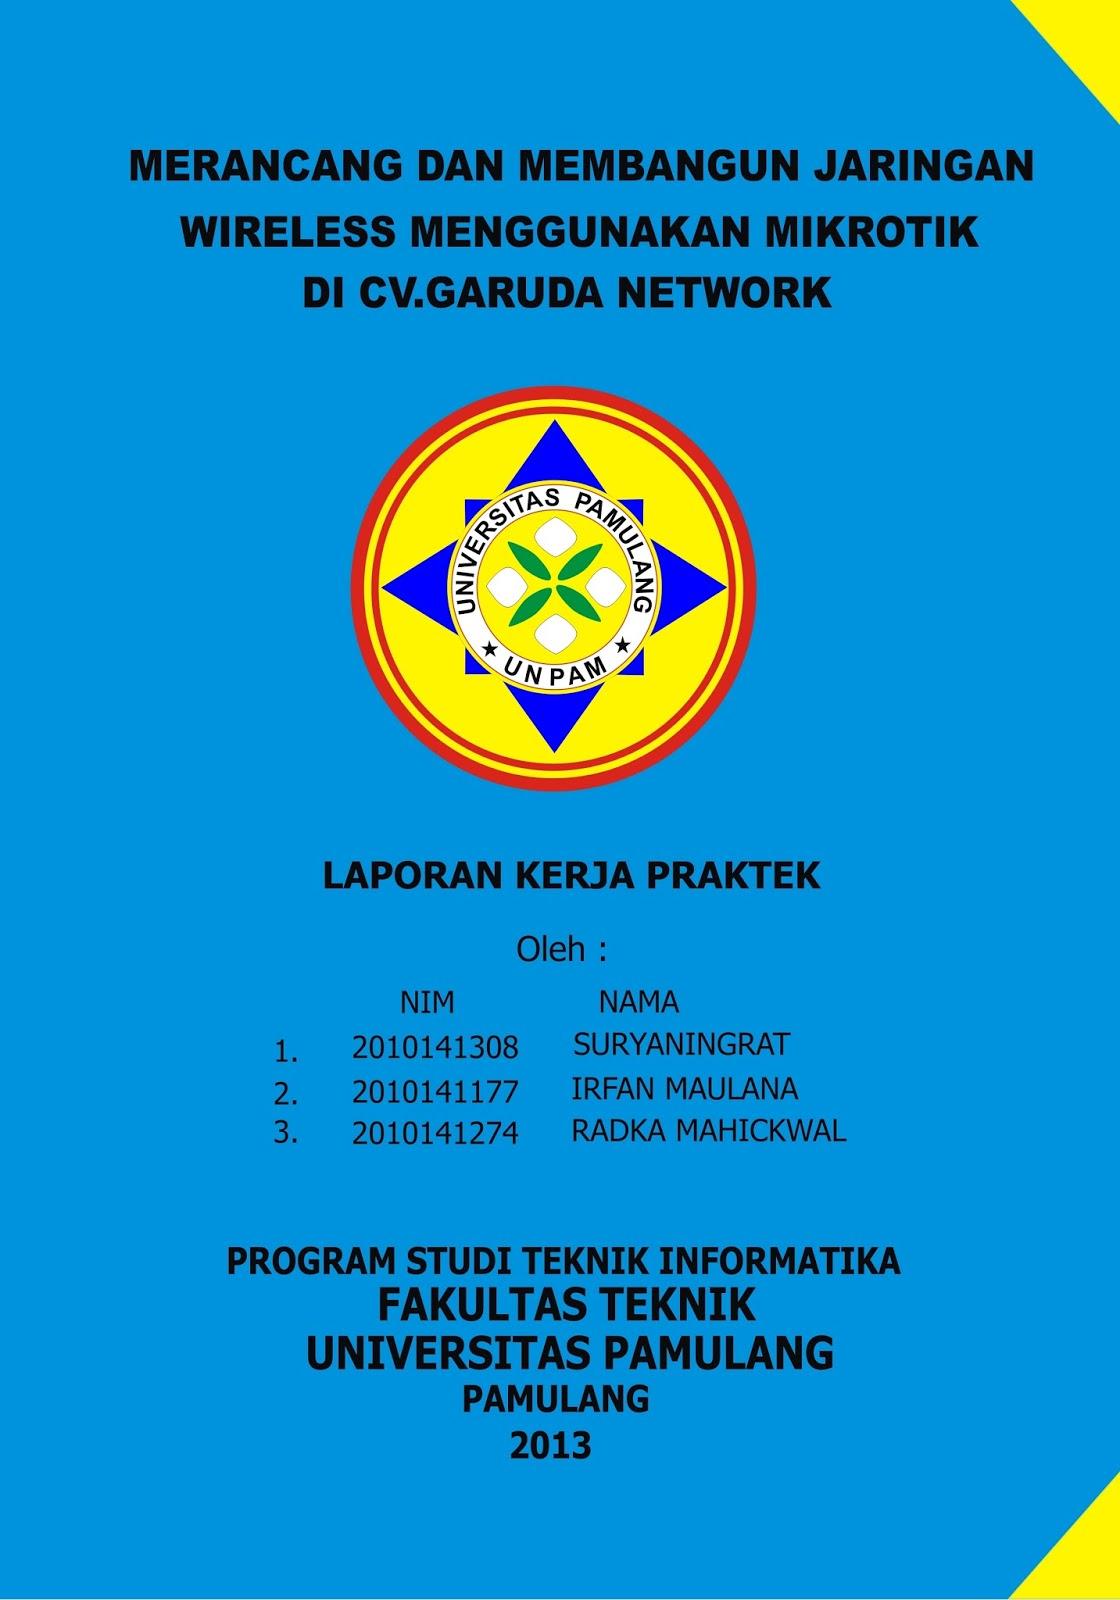 Contoh Cover Makalah Universitas Islam Riau Any Formats